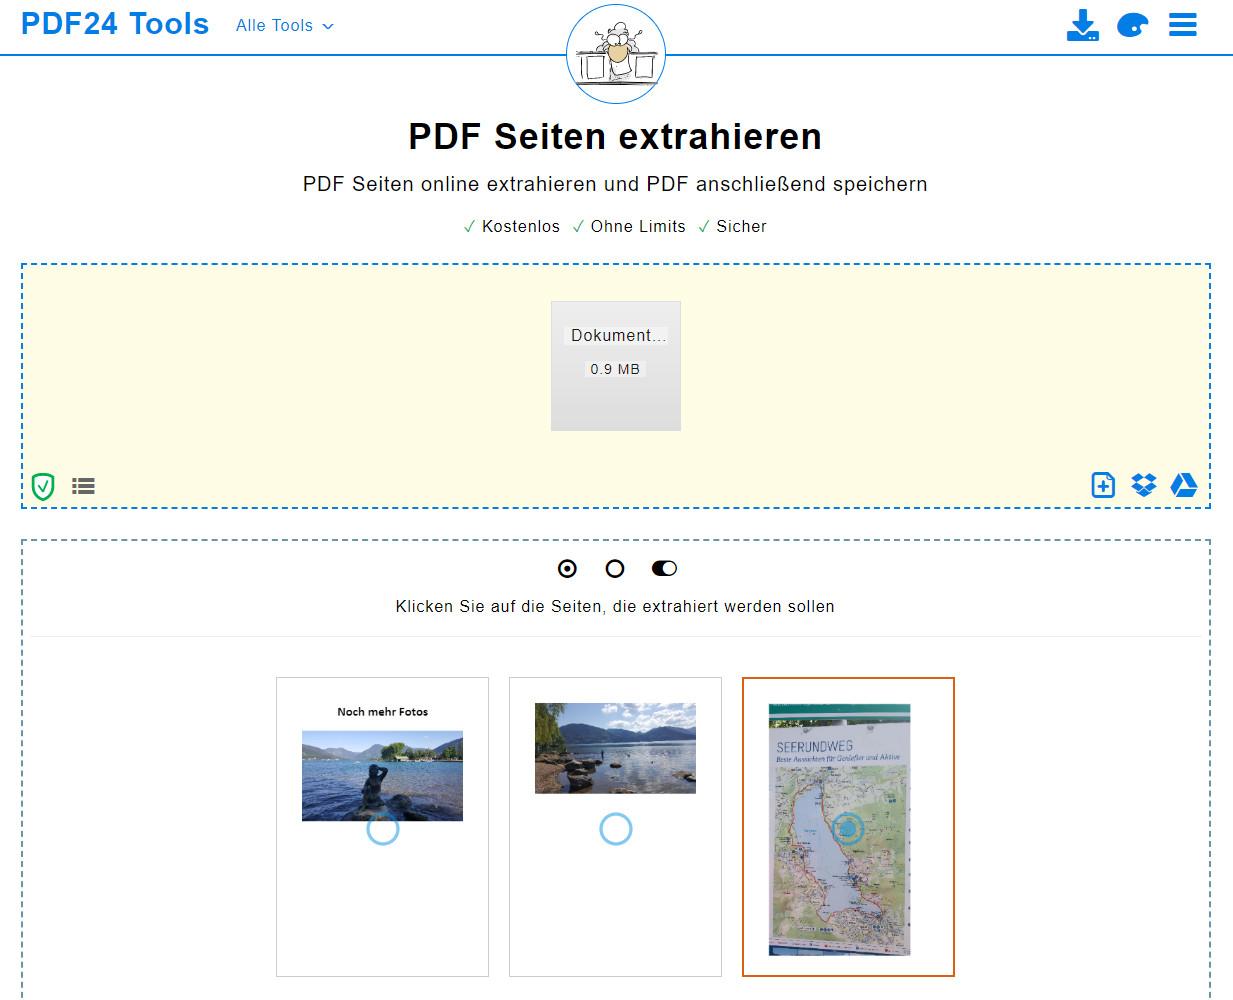 Screenshot 1 - PDF-Seiten extrahieren